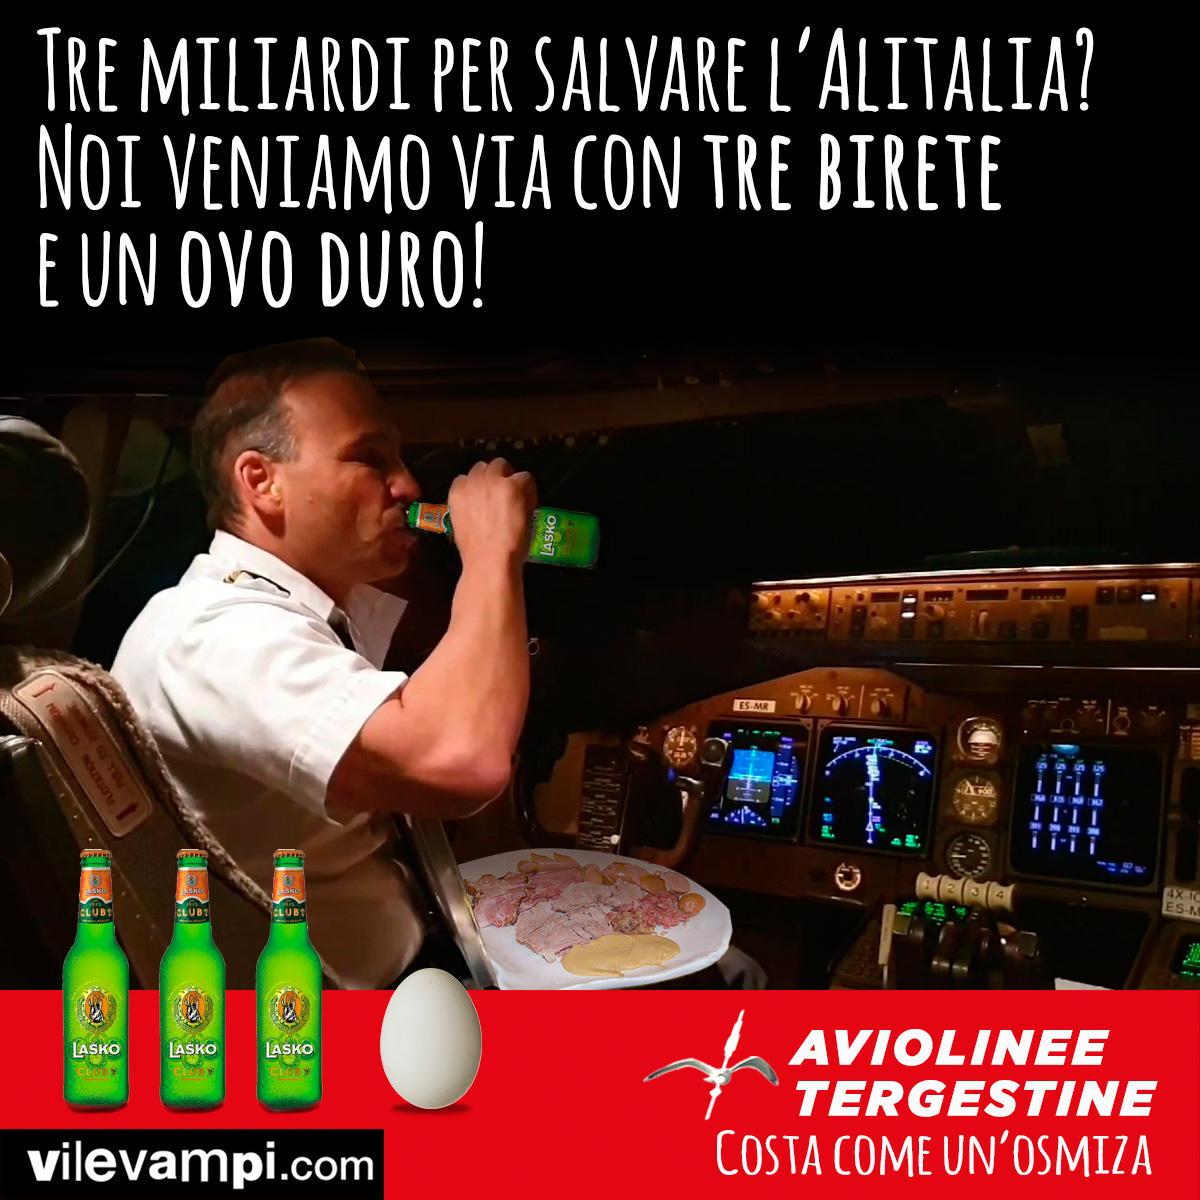 2020_Aviolineee-TS_alitalia